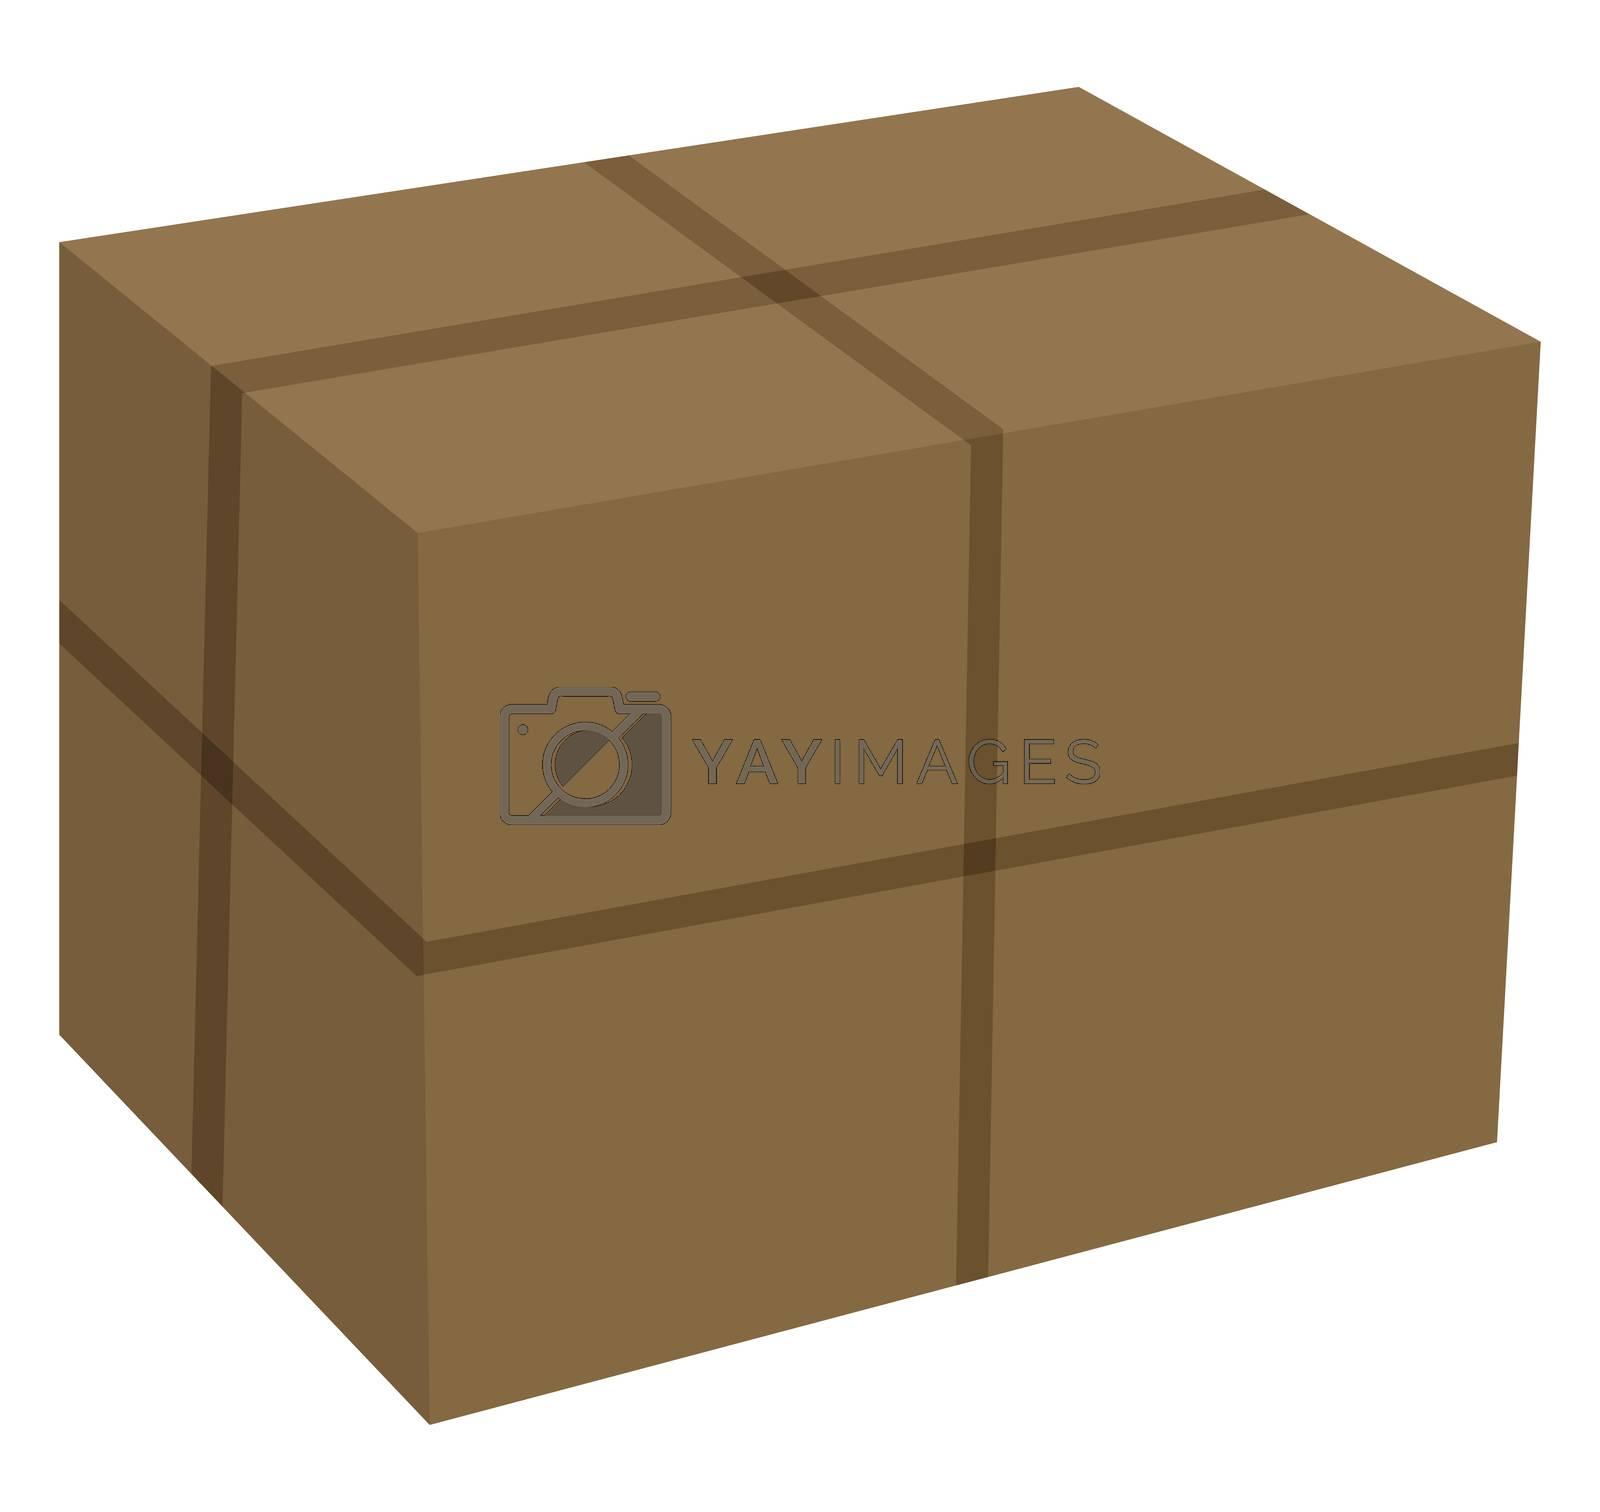 Carton box, illustration, vector on white background